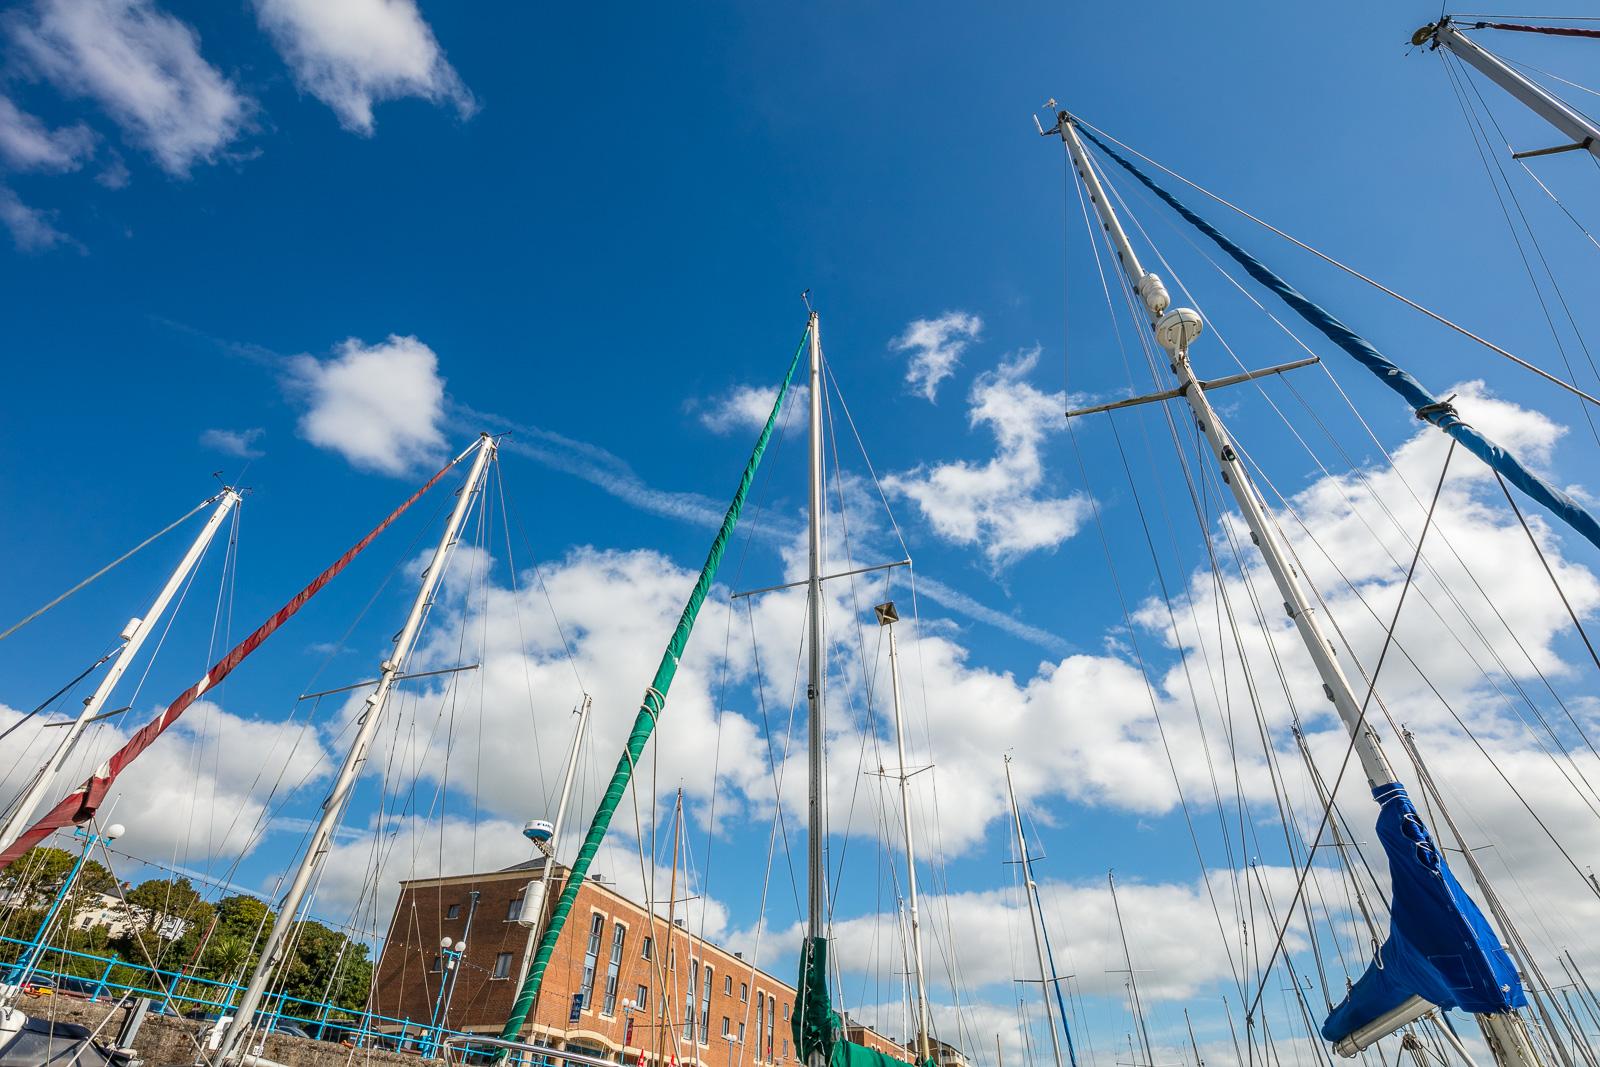 Berthing & Boatyard Storage Promotions at Milford Marina